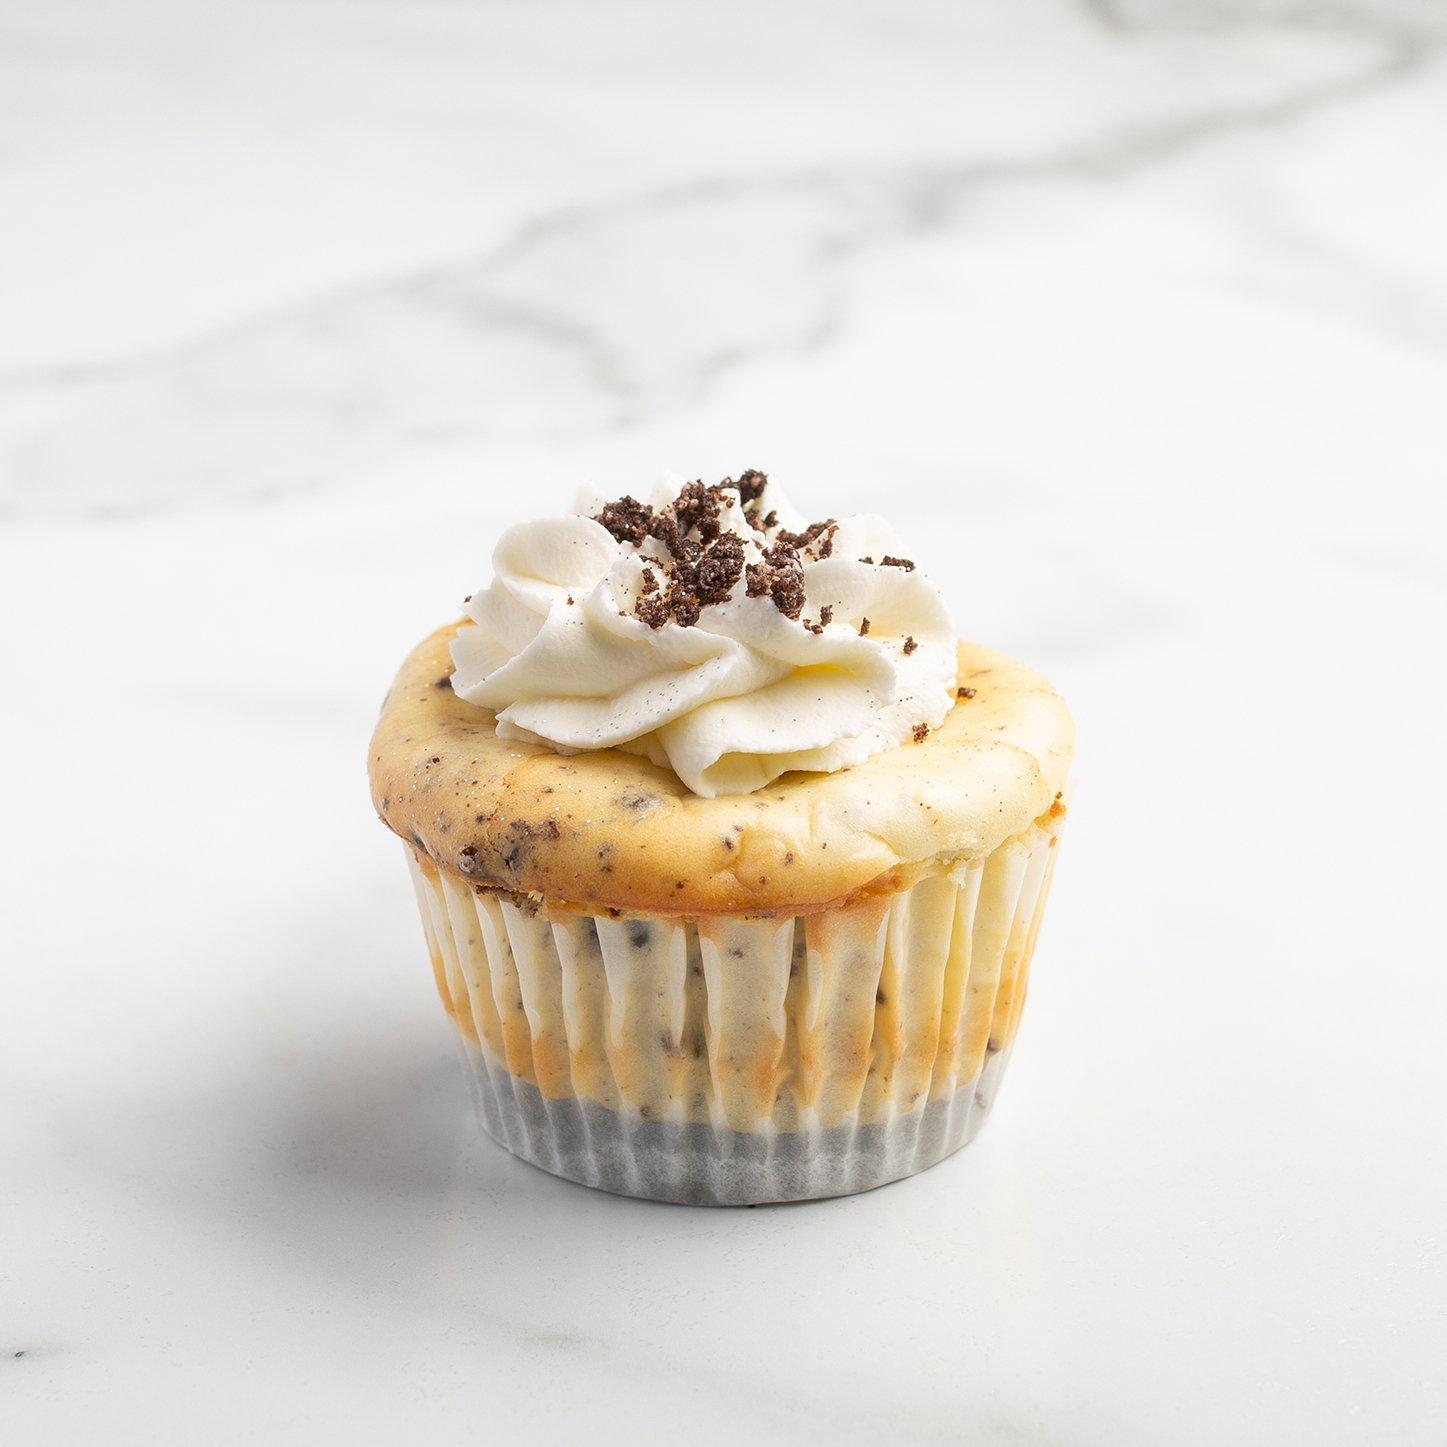 Cookies and Cream Cheesecake - Standard